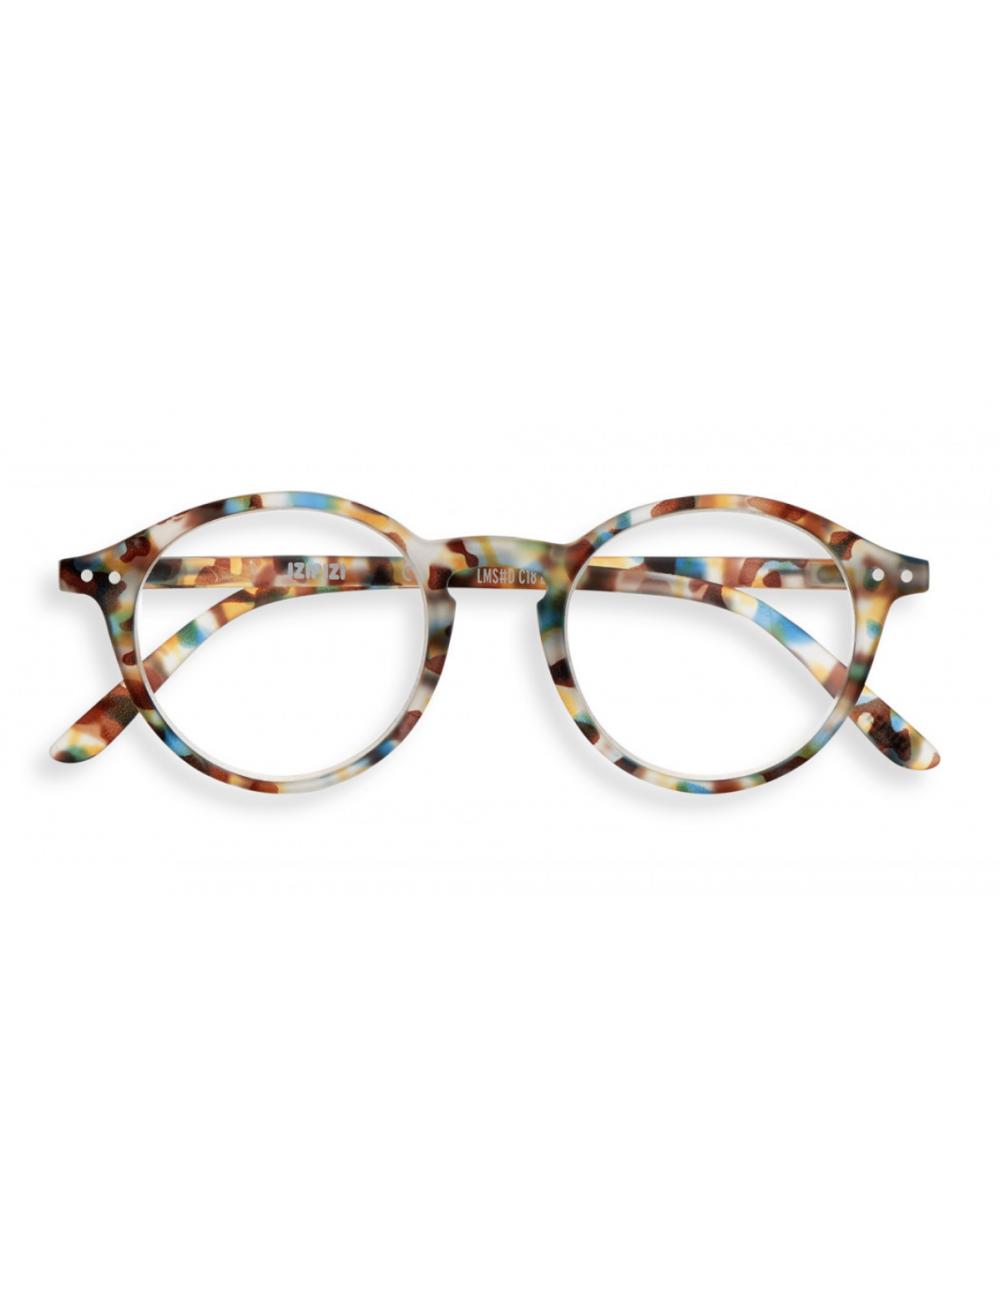 Leesbril #D | blue tortoise